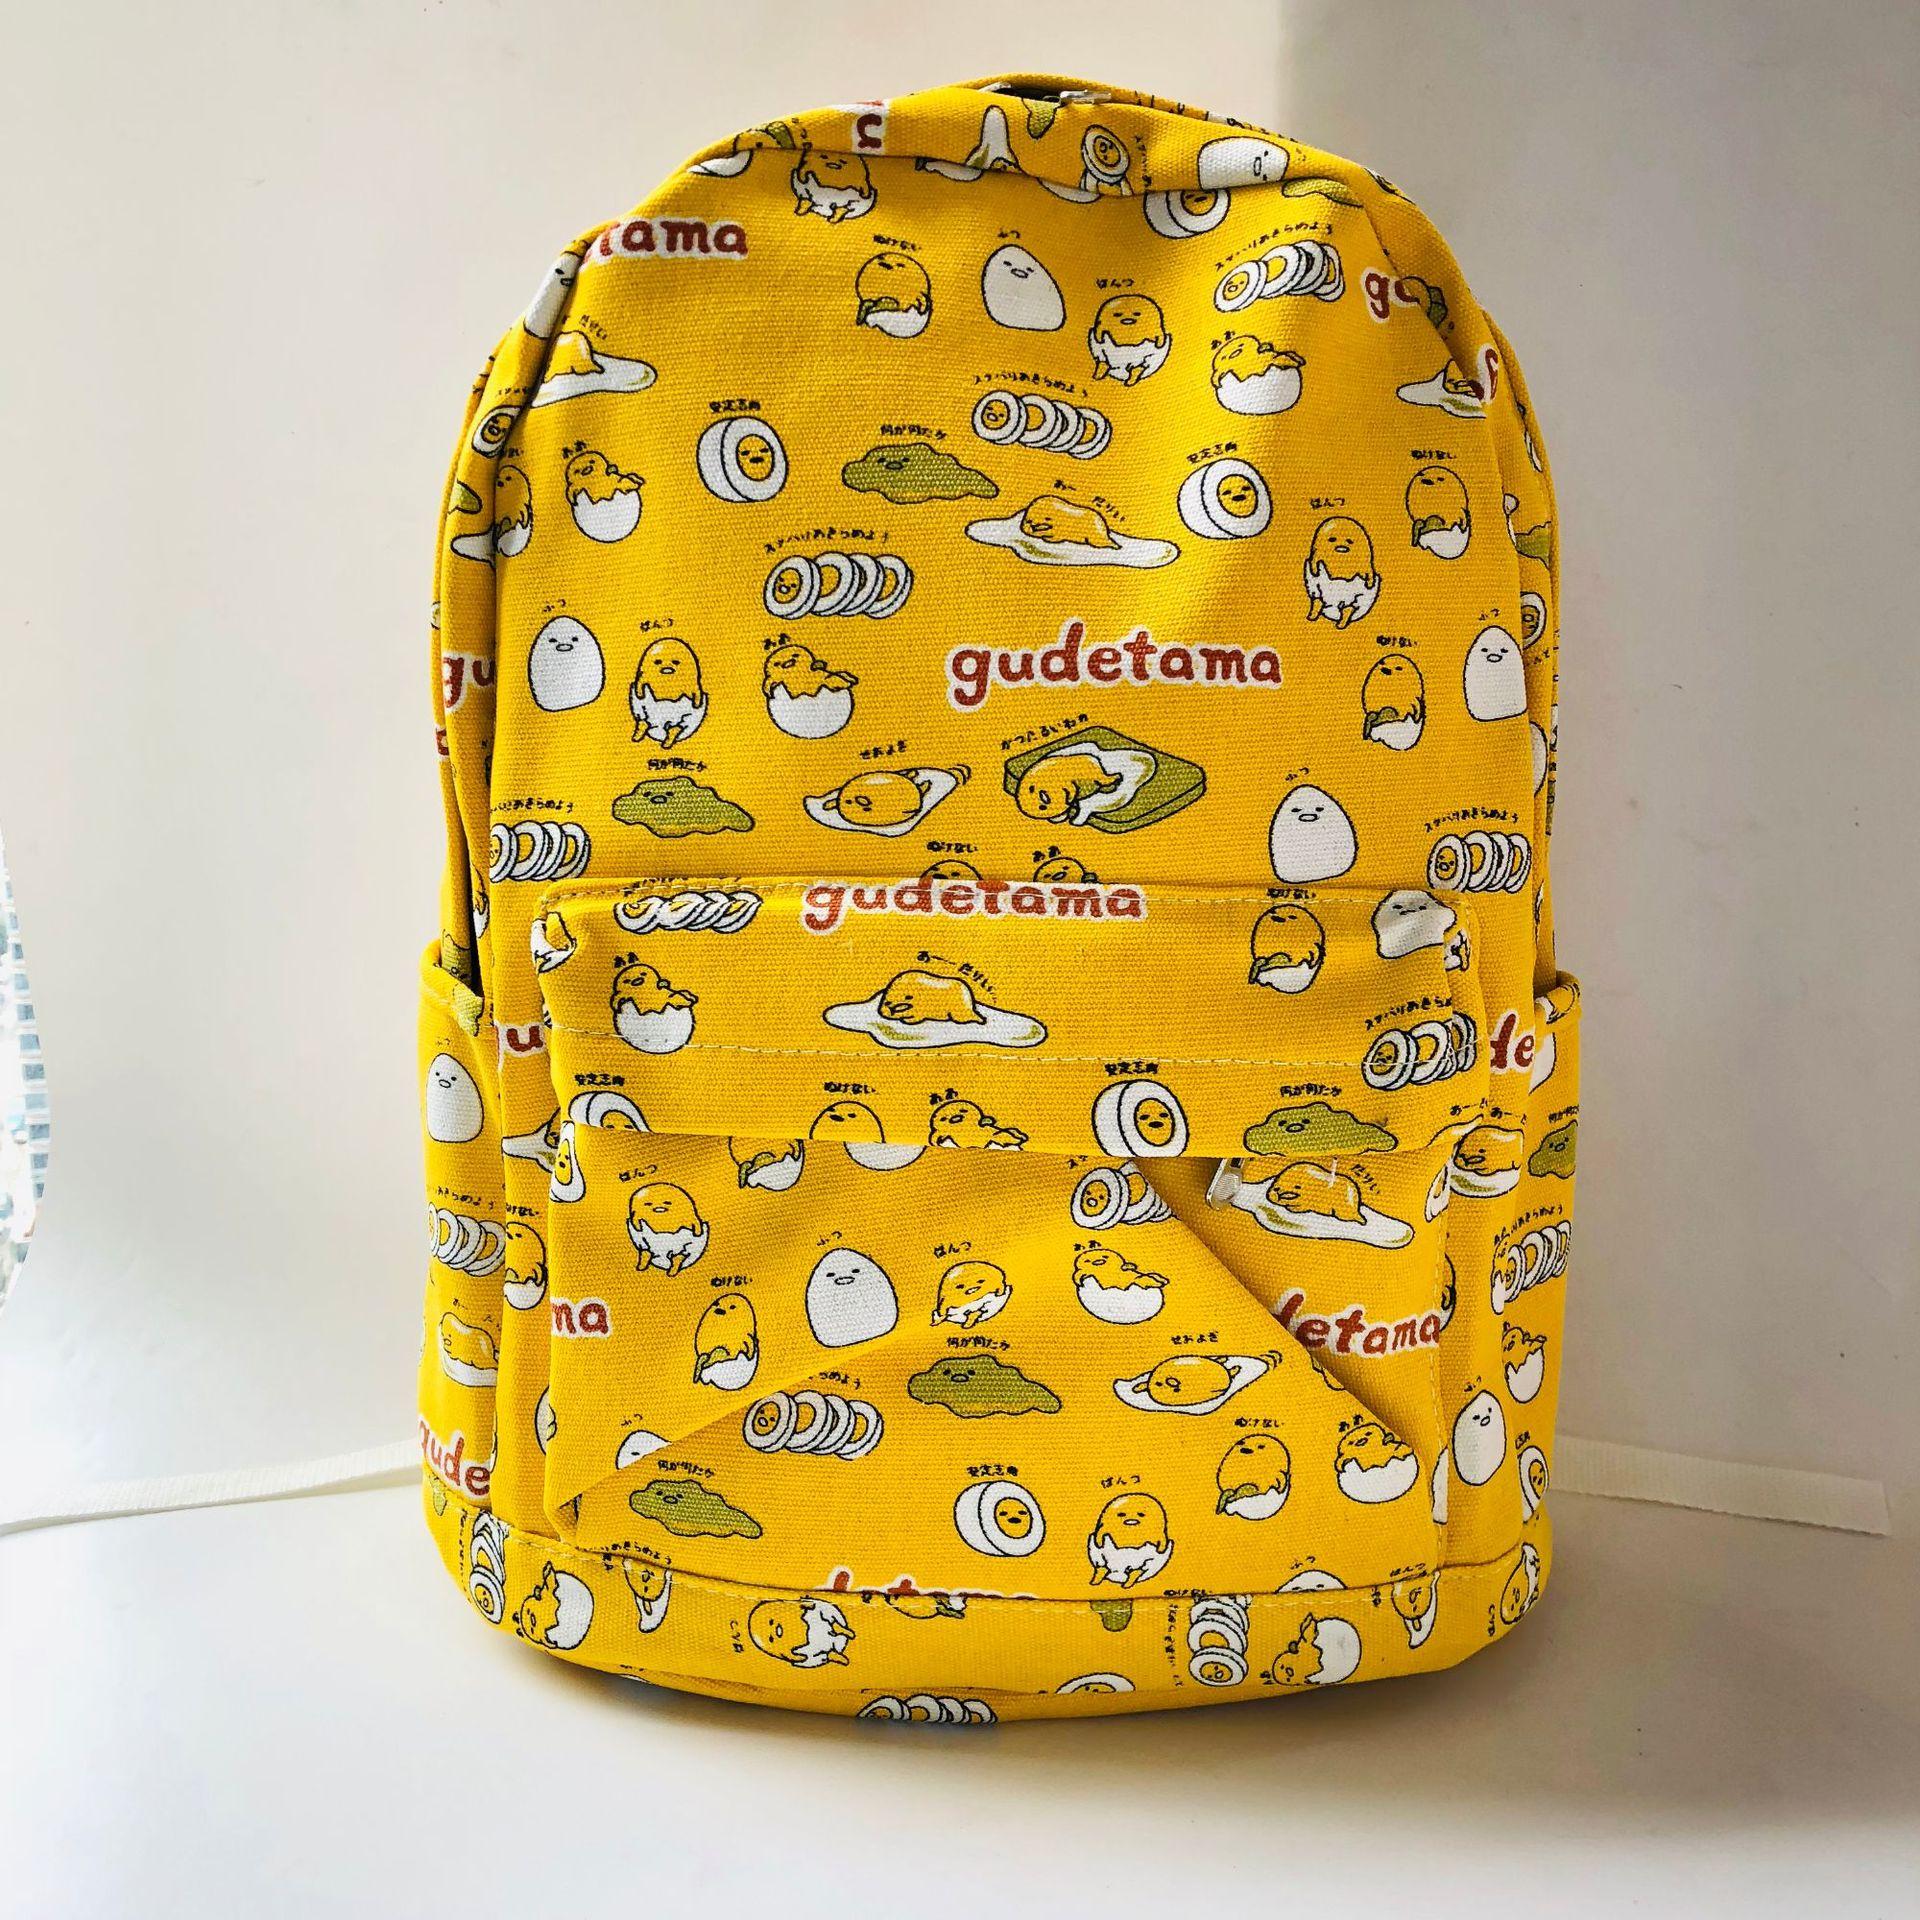 "Gudetama yellow egg 15/"" backpack travel tote laptop school bags anime new"